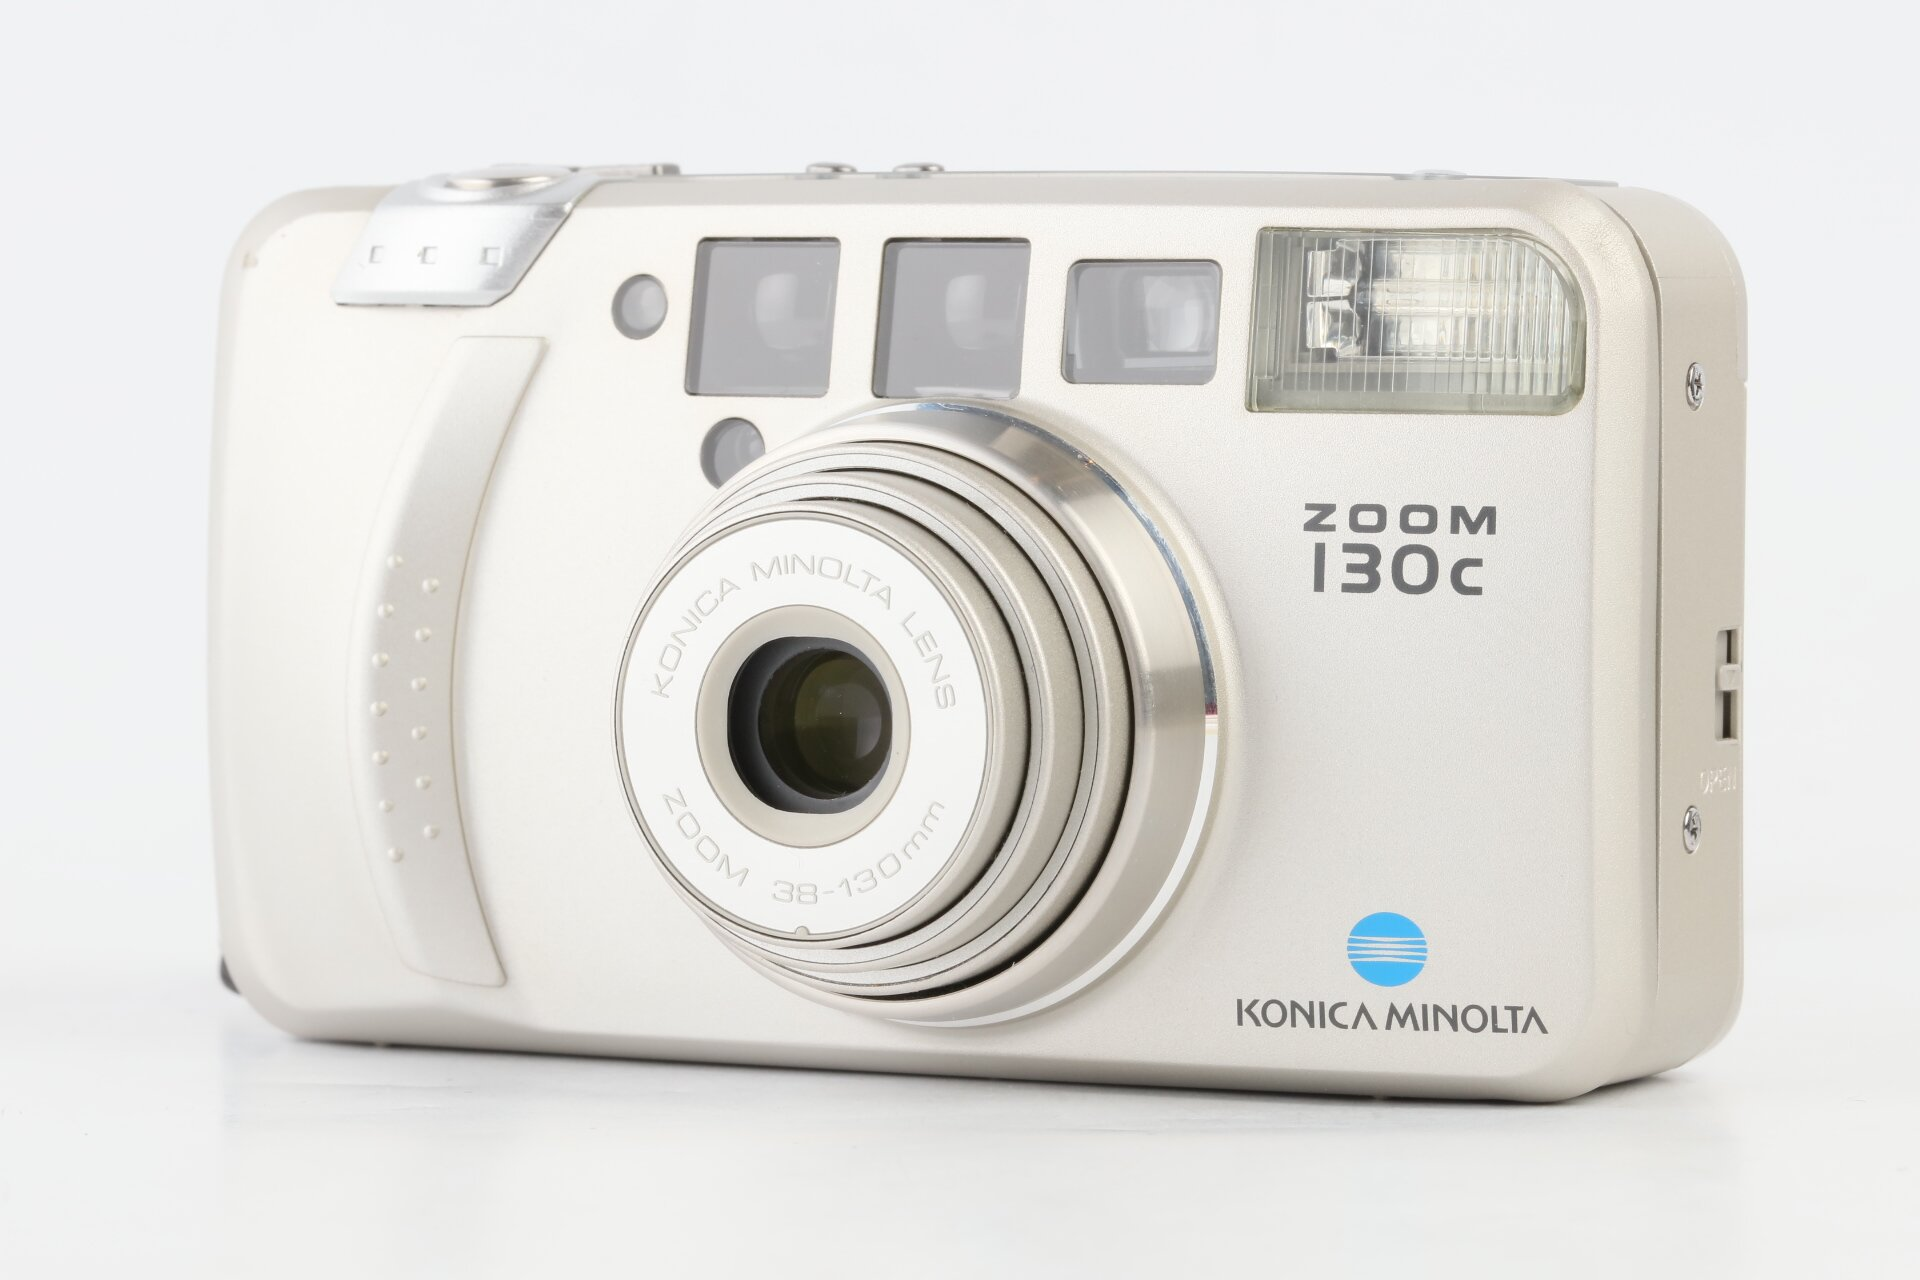 Konica Minolta ZOOM 130c 38-130mm zoom Kompaktkamera